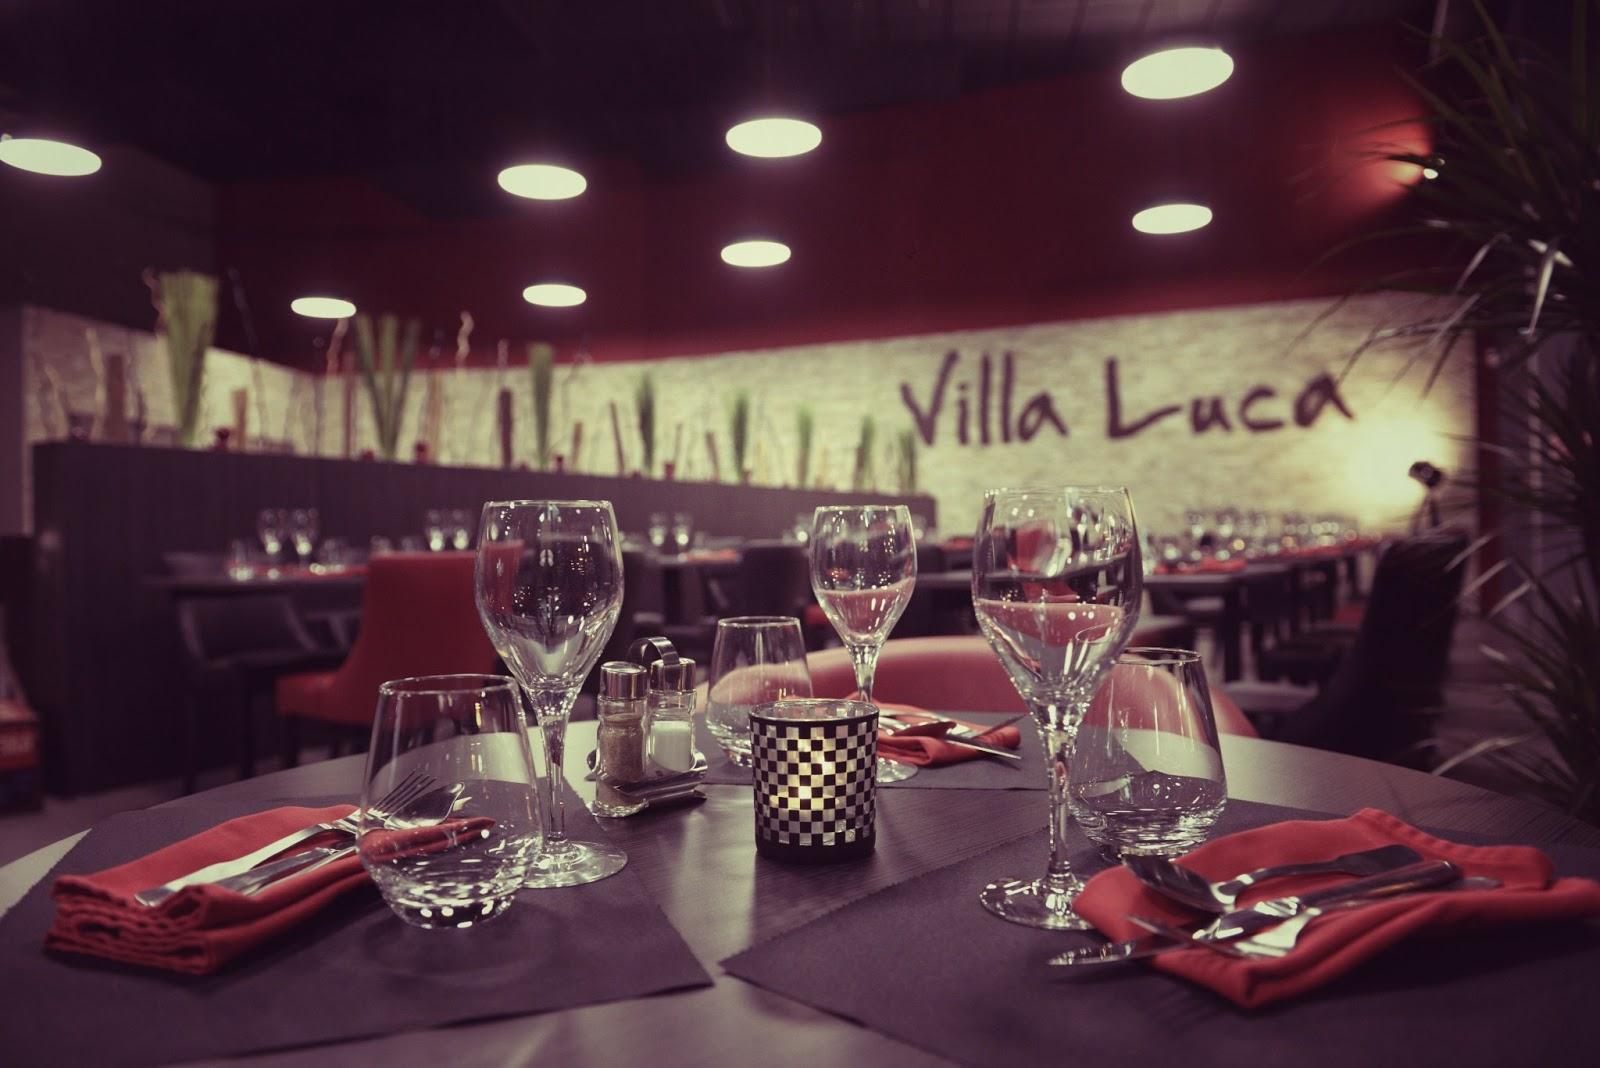 http://madame-zazie.blogspot.com/2017/01/restaurant-italien-villa-luca.html